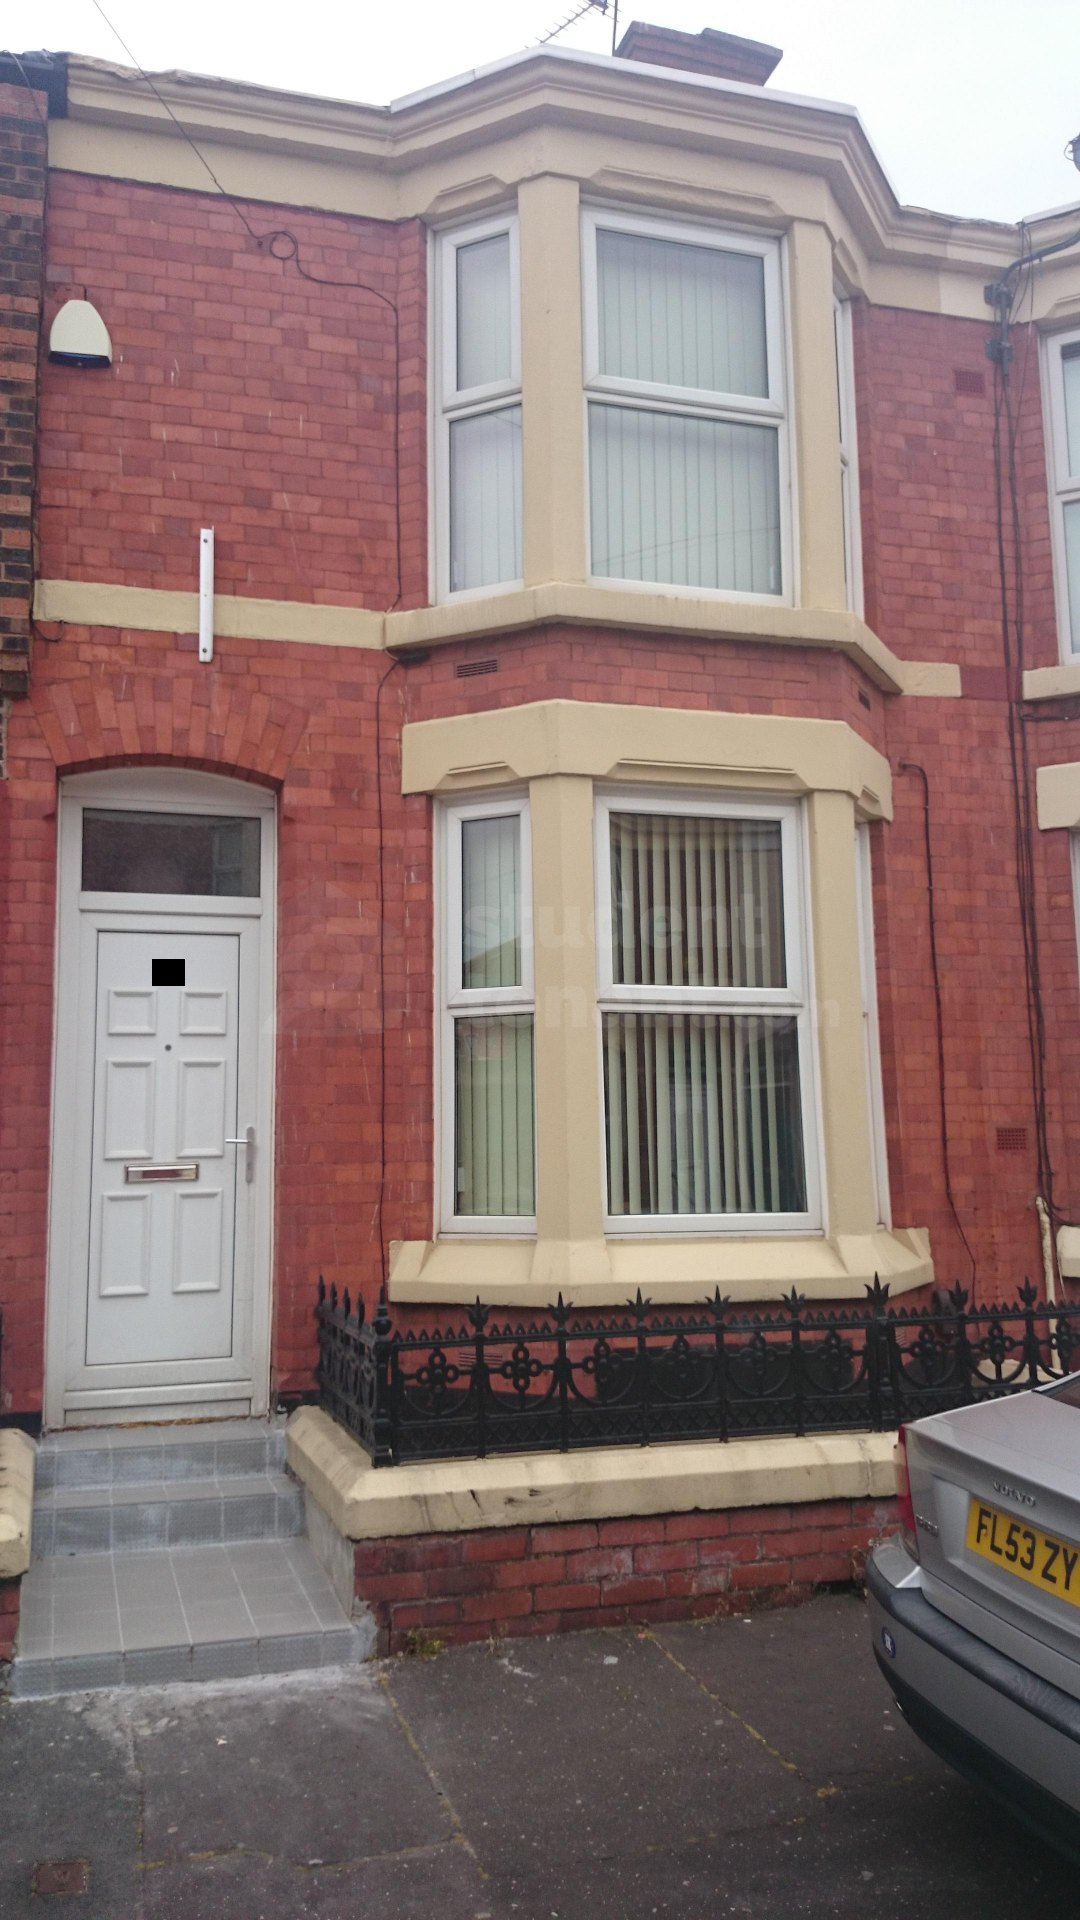 4 Bedroom Student House in Kensington, Liverpool, L7 ...